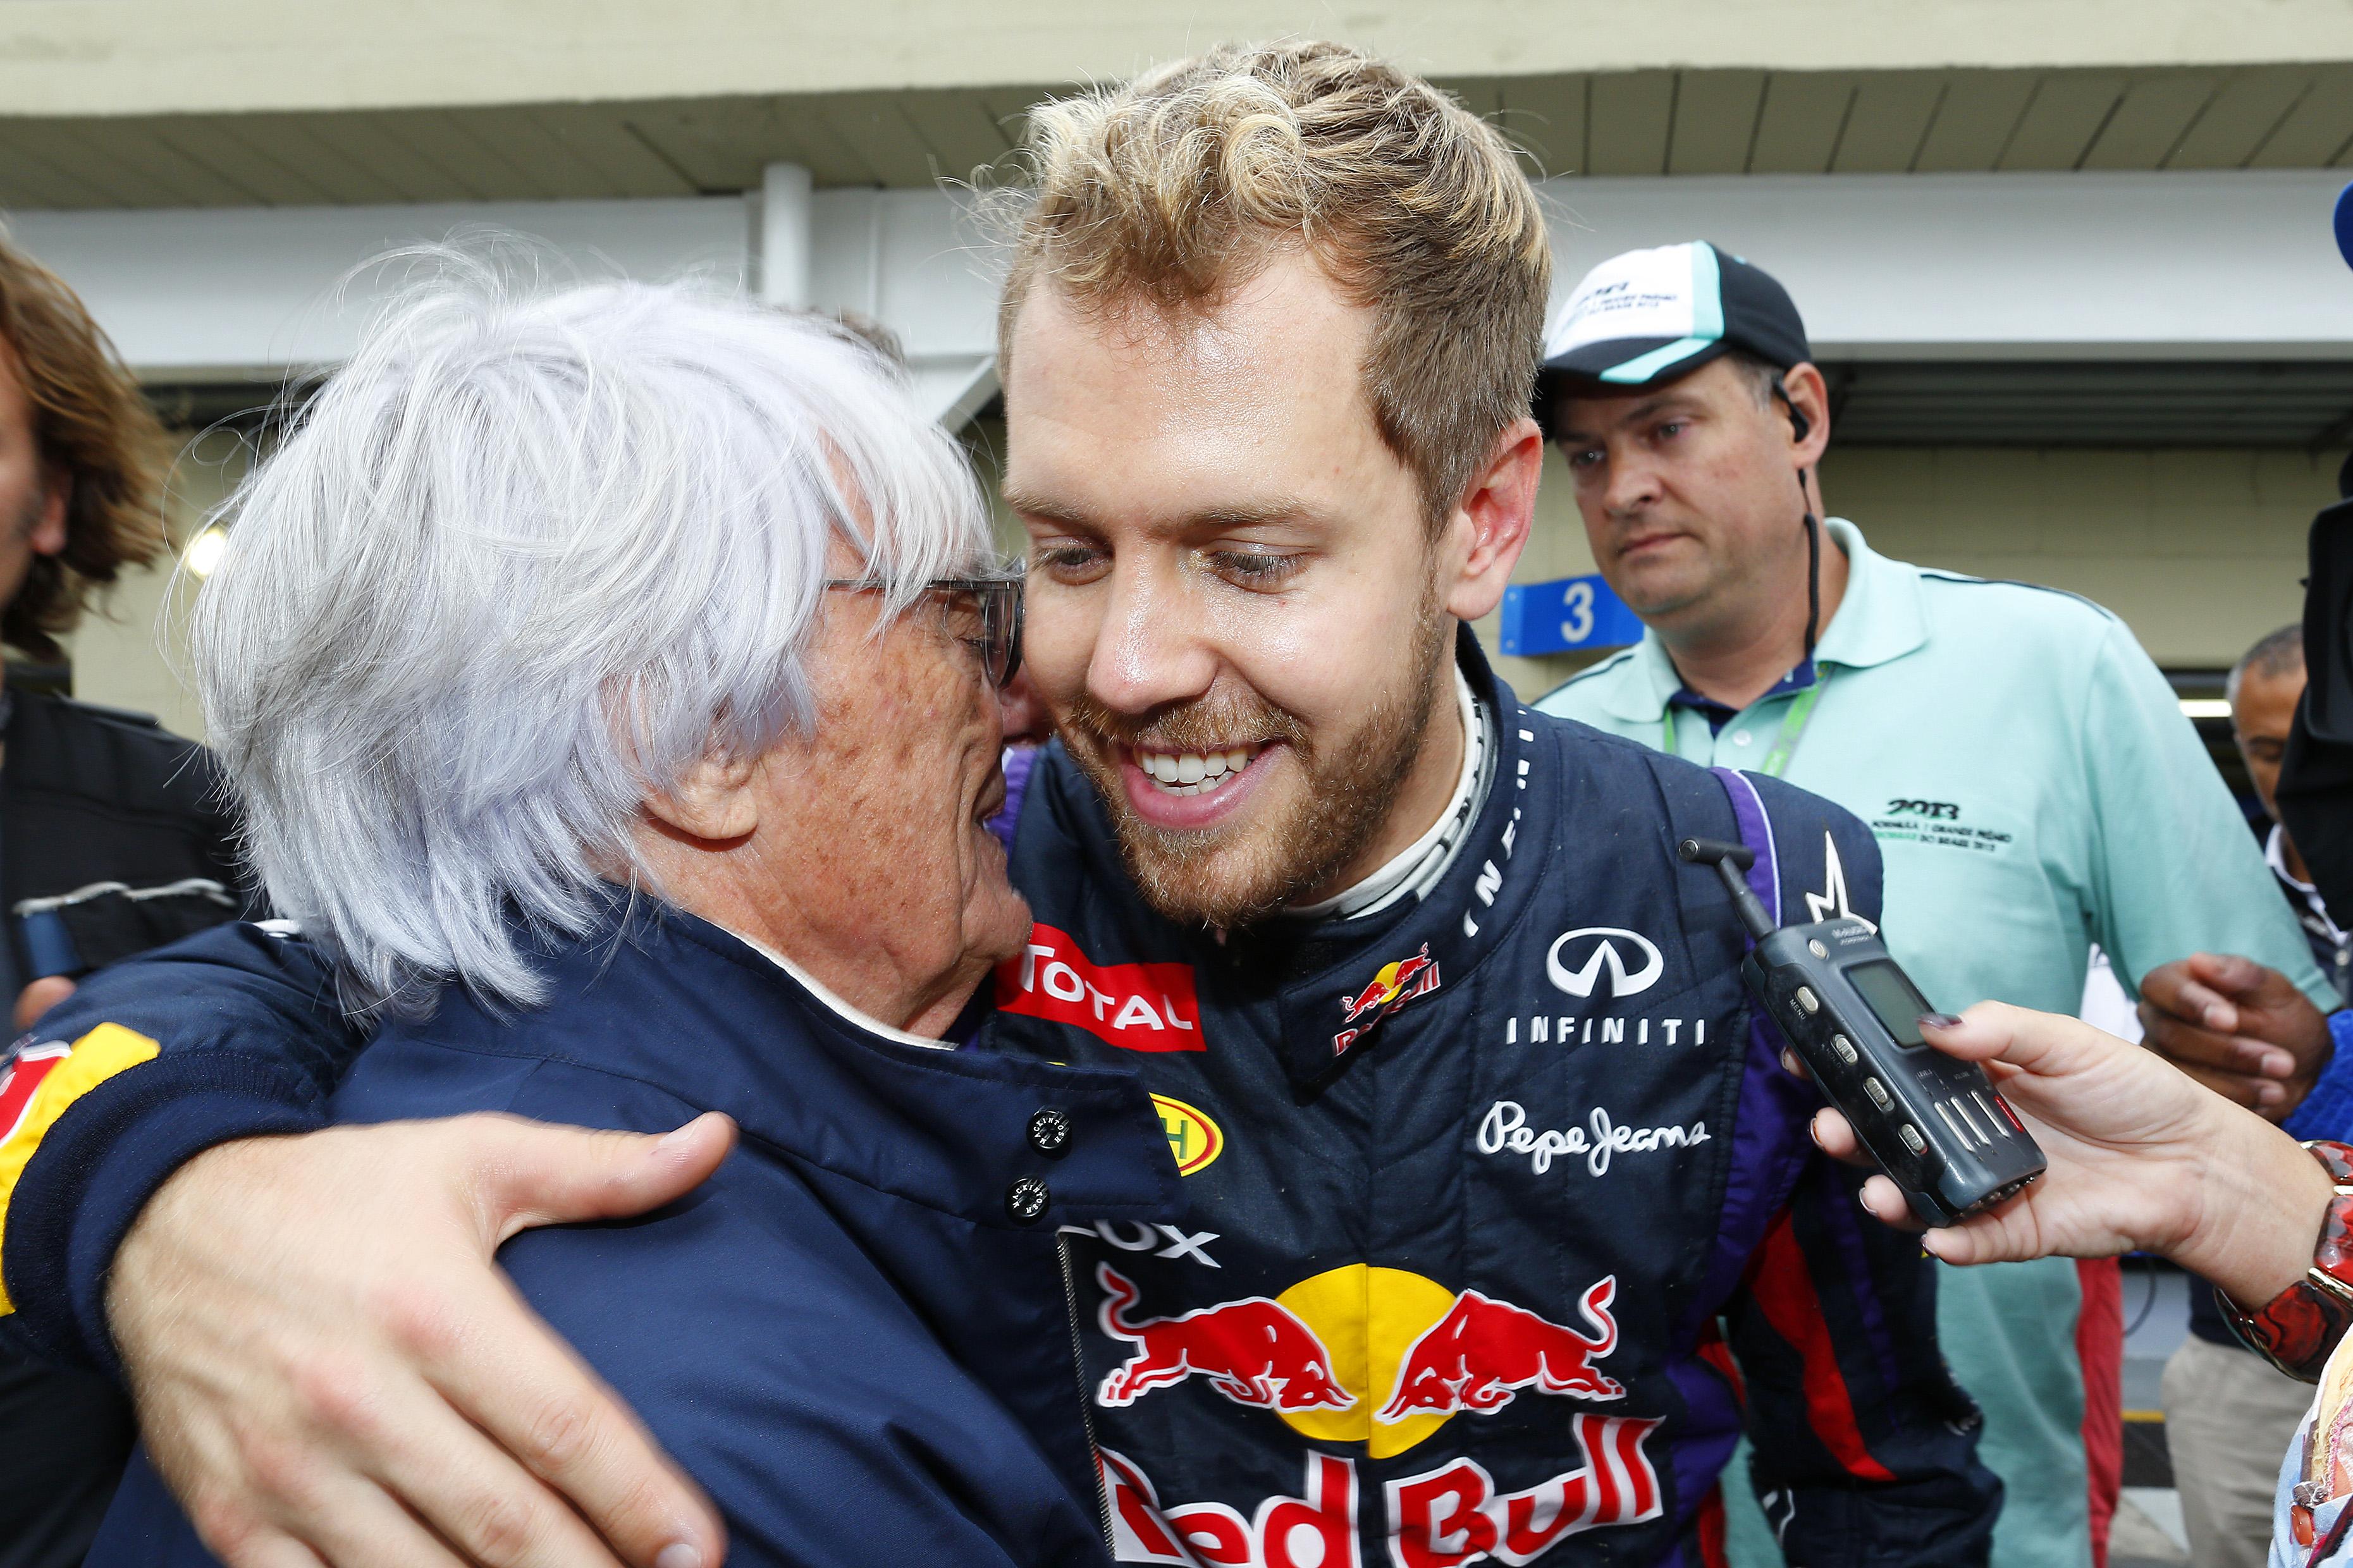 F1 2013 - Brazilian Grand Prix